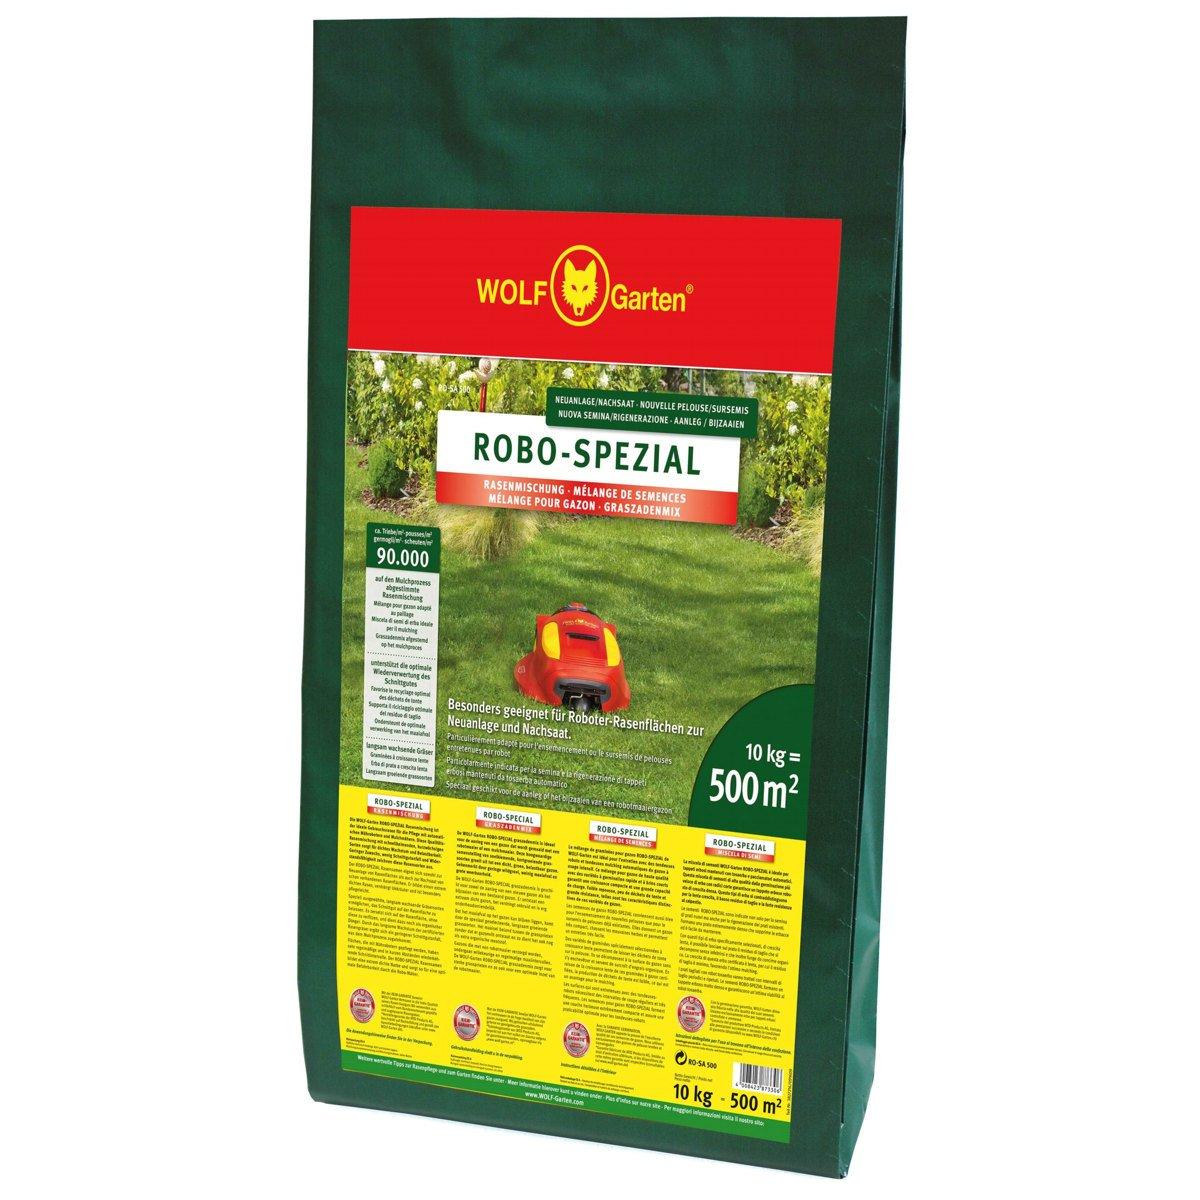 WOLF-Garten ROBO-Spezial-Rasensamen 10kg für 500qm RO-SA 500